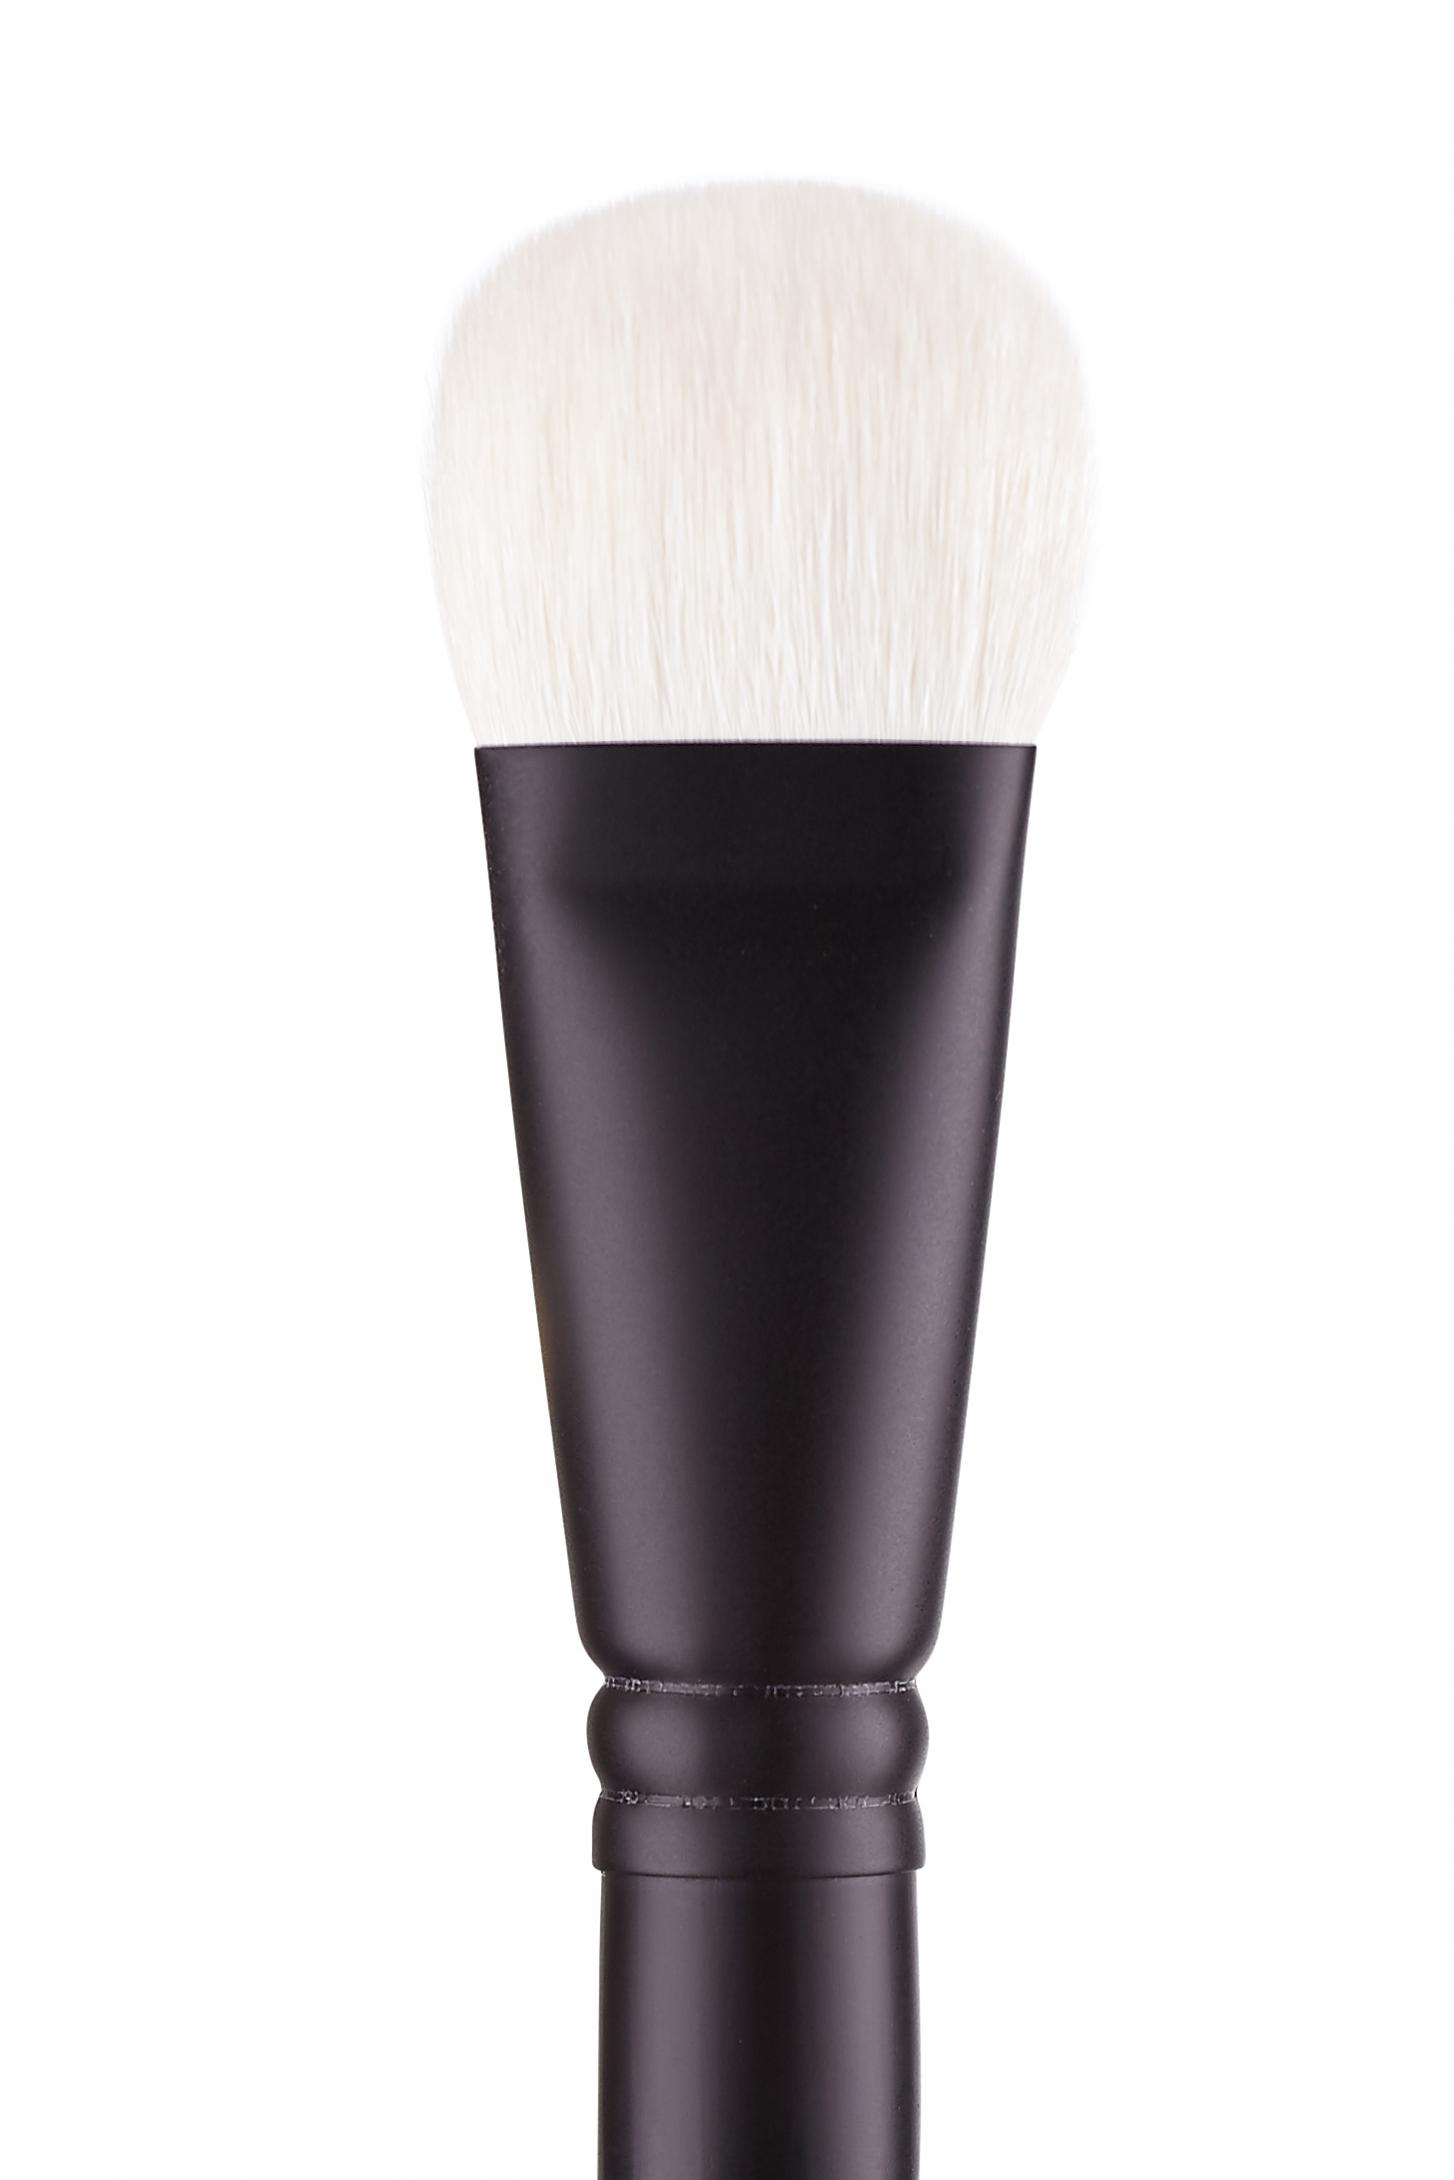 Bristles brushes for tone and cream correction Annbeauty Katakana S21